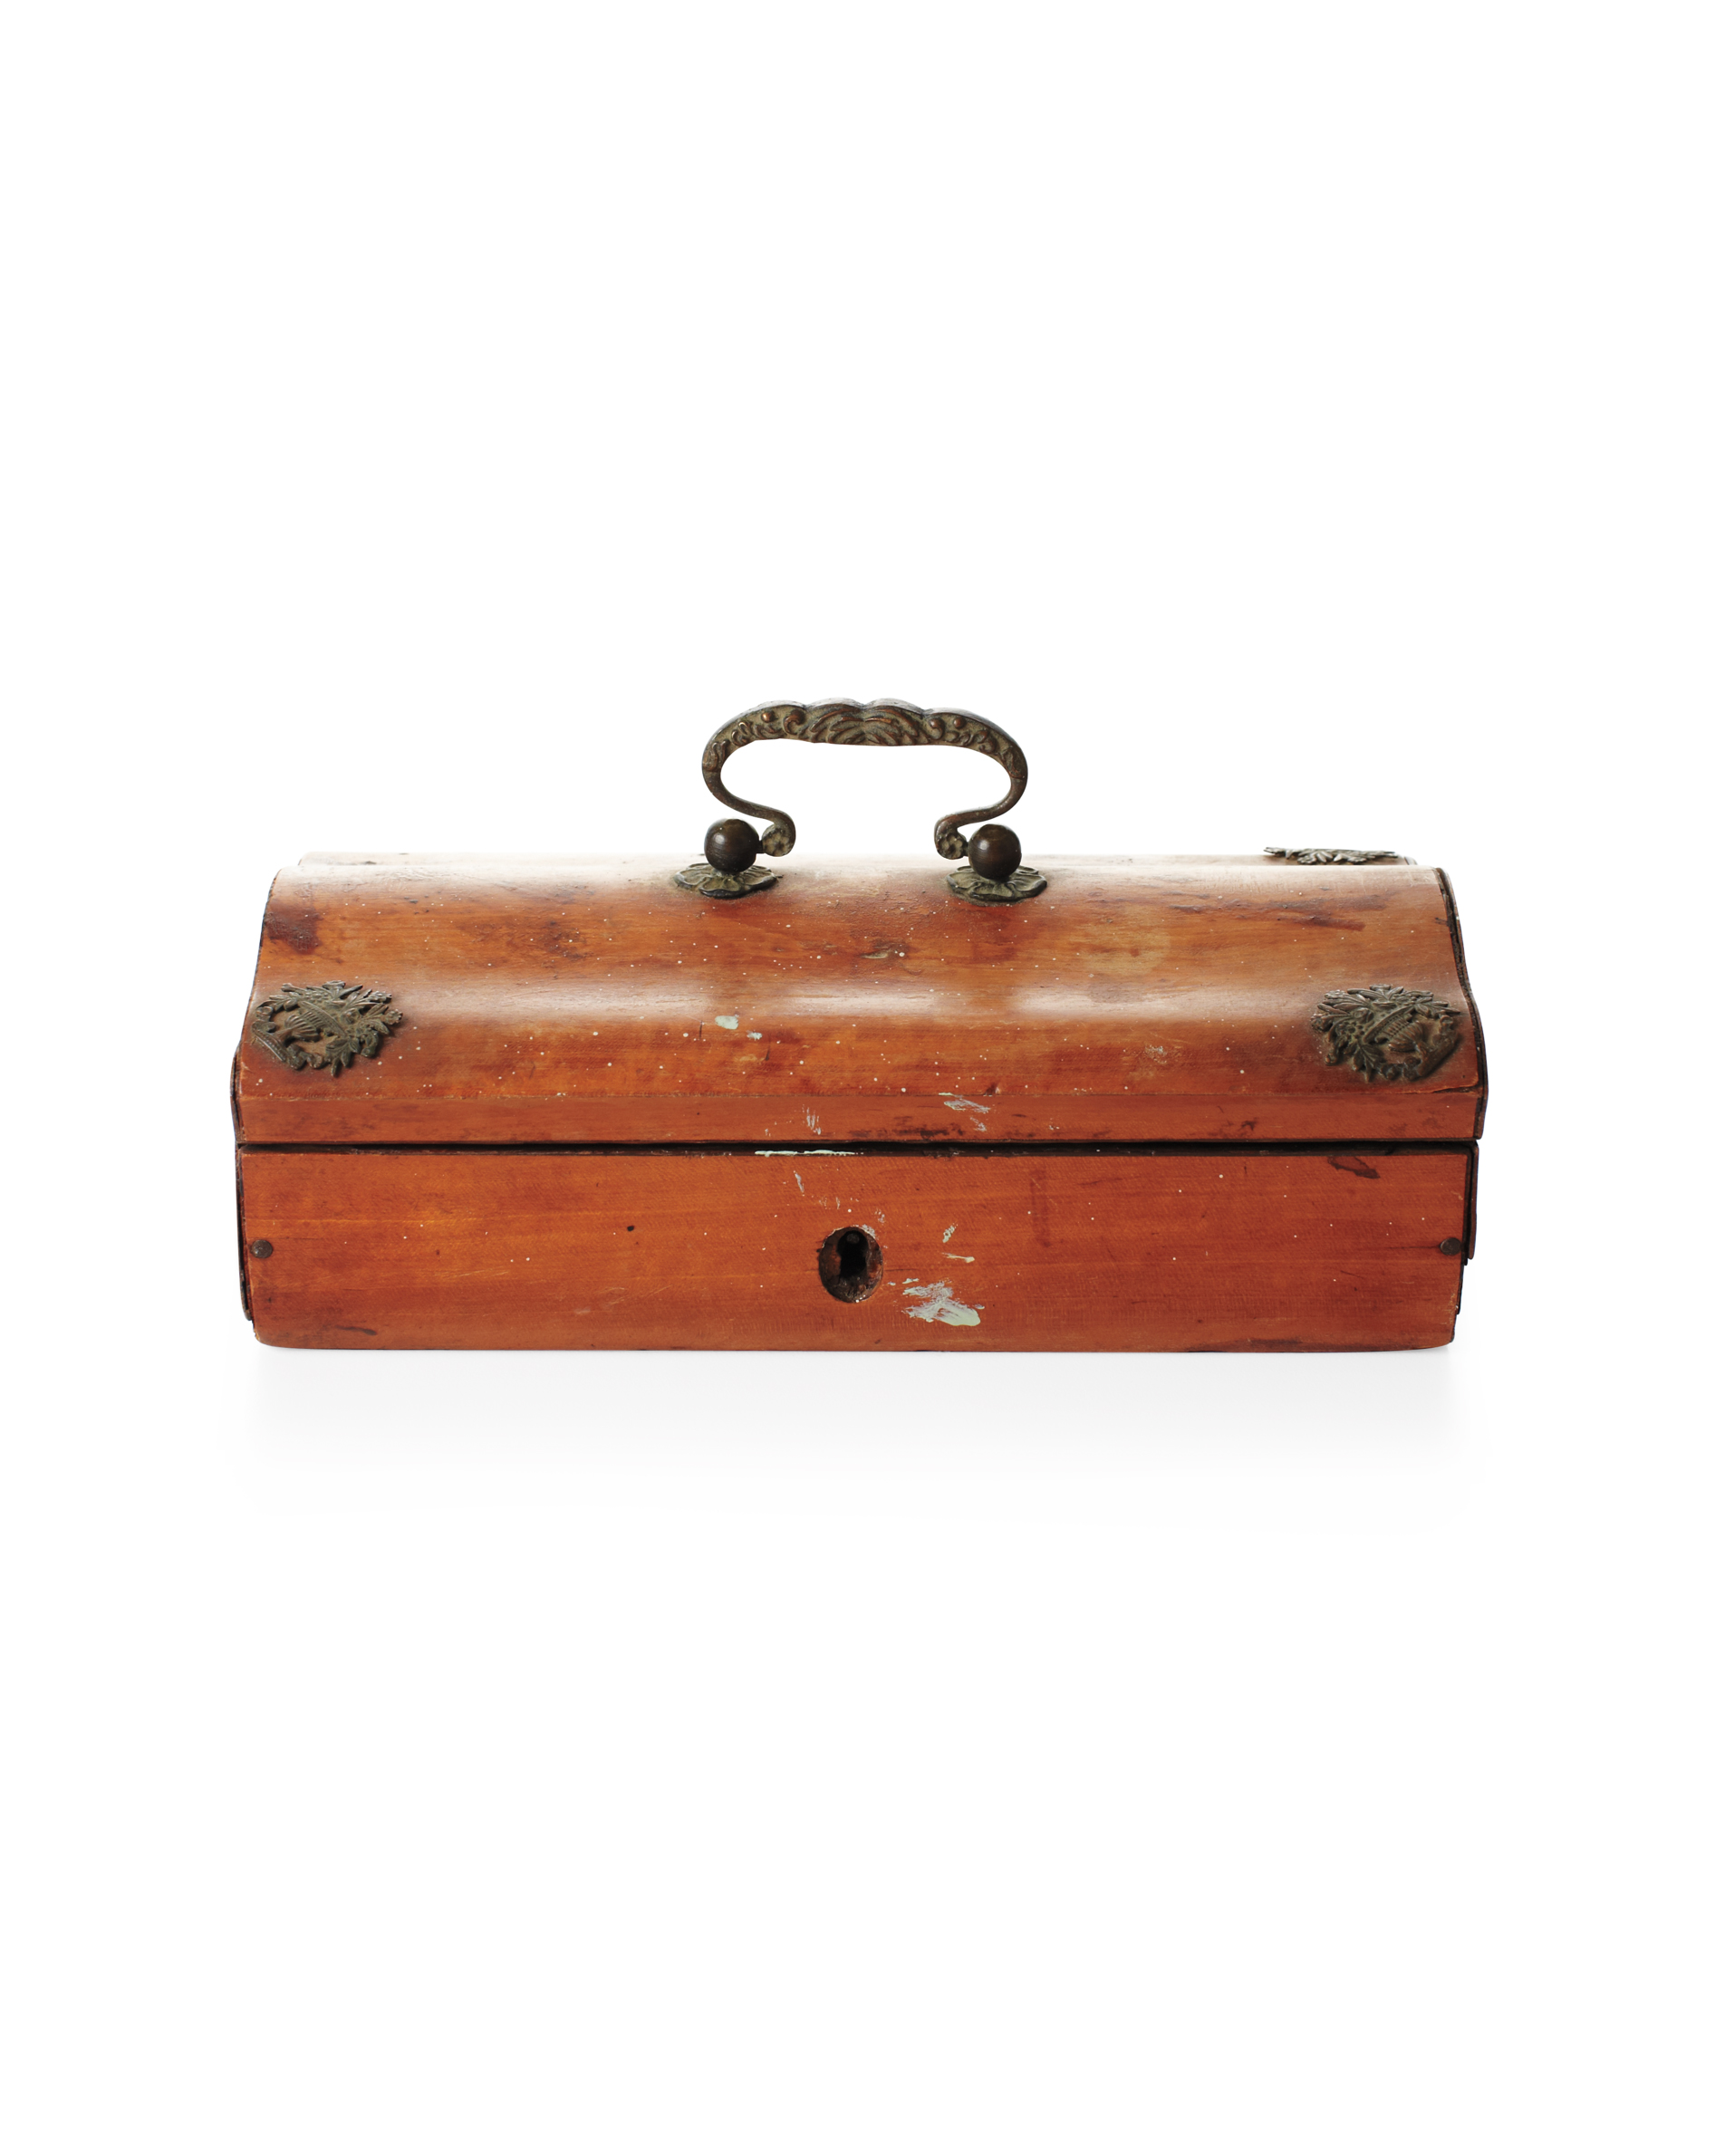 antique-box-007-md108883.jpg